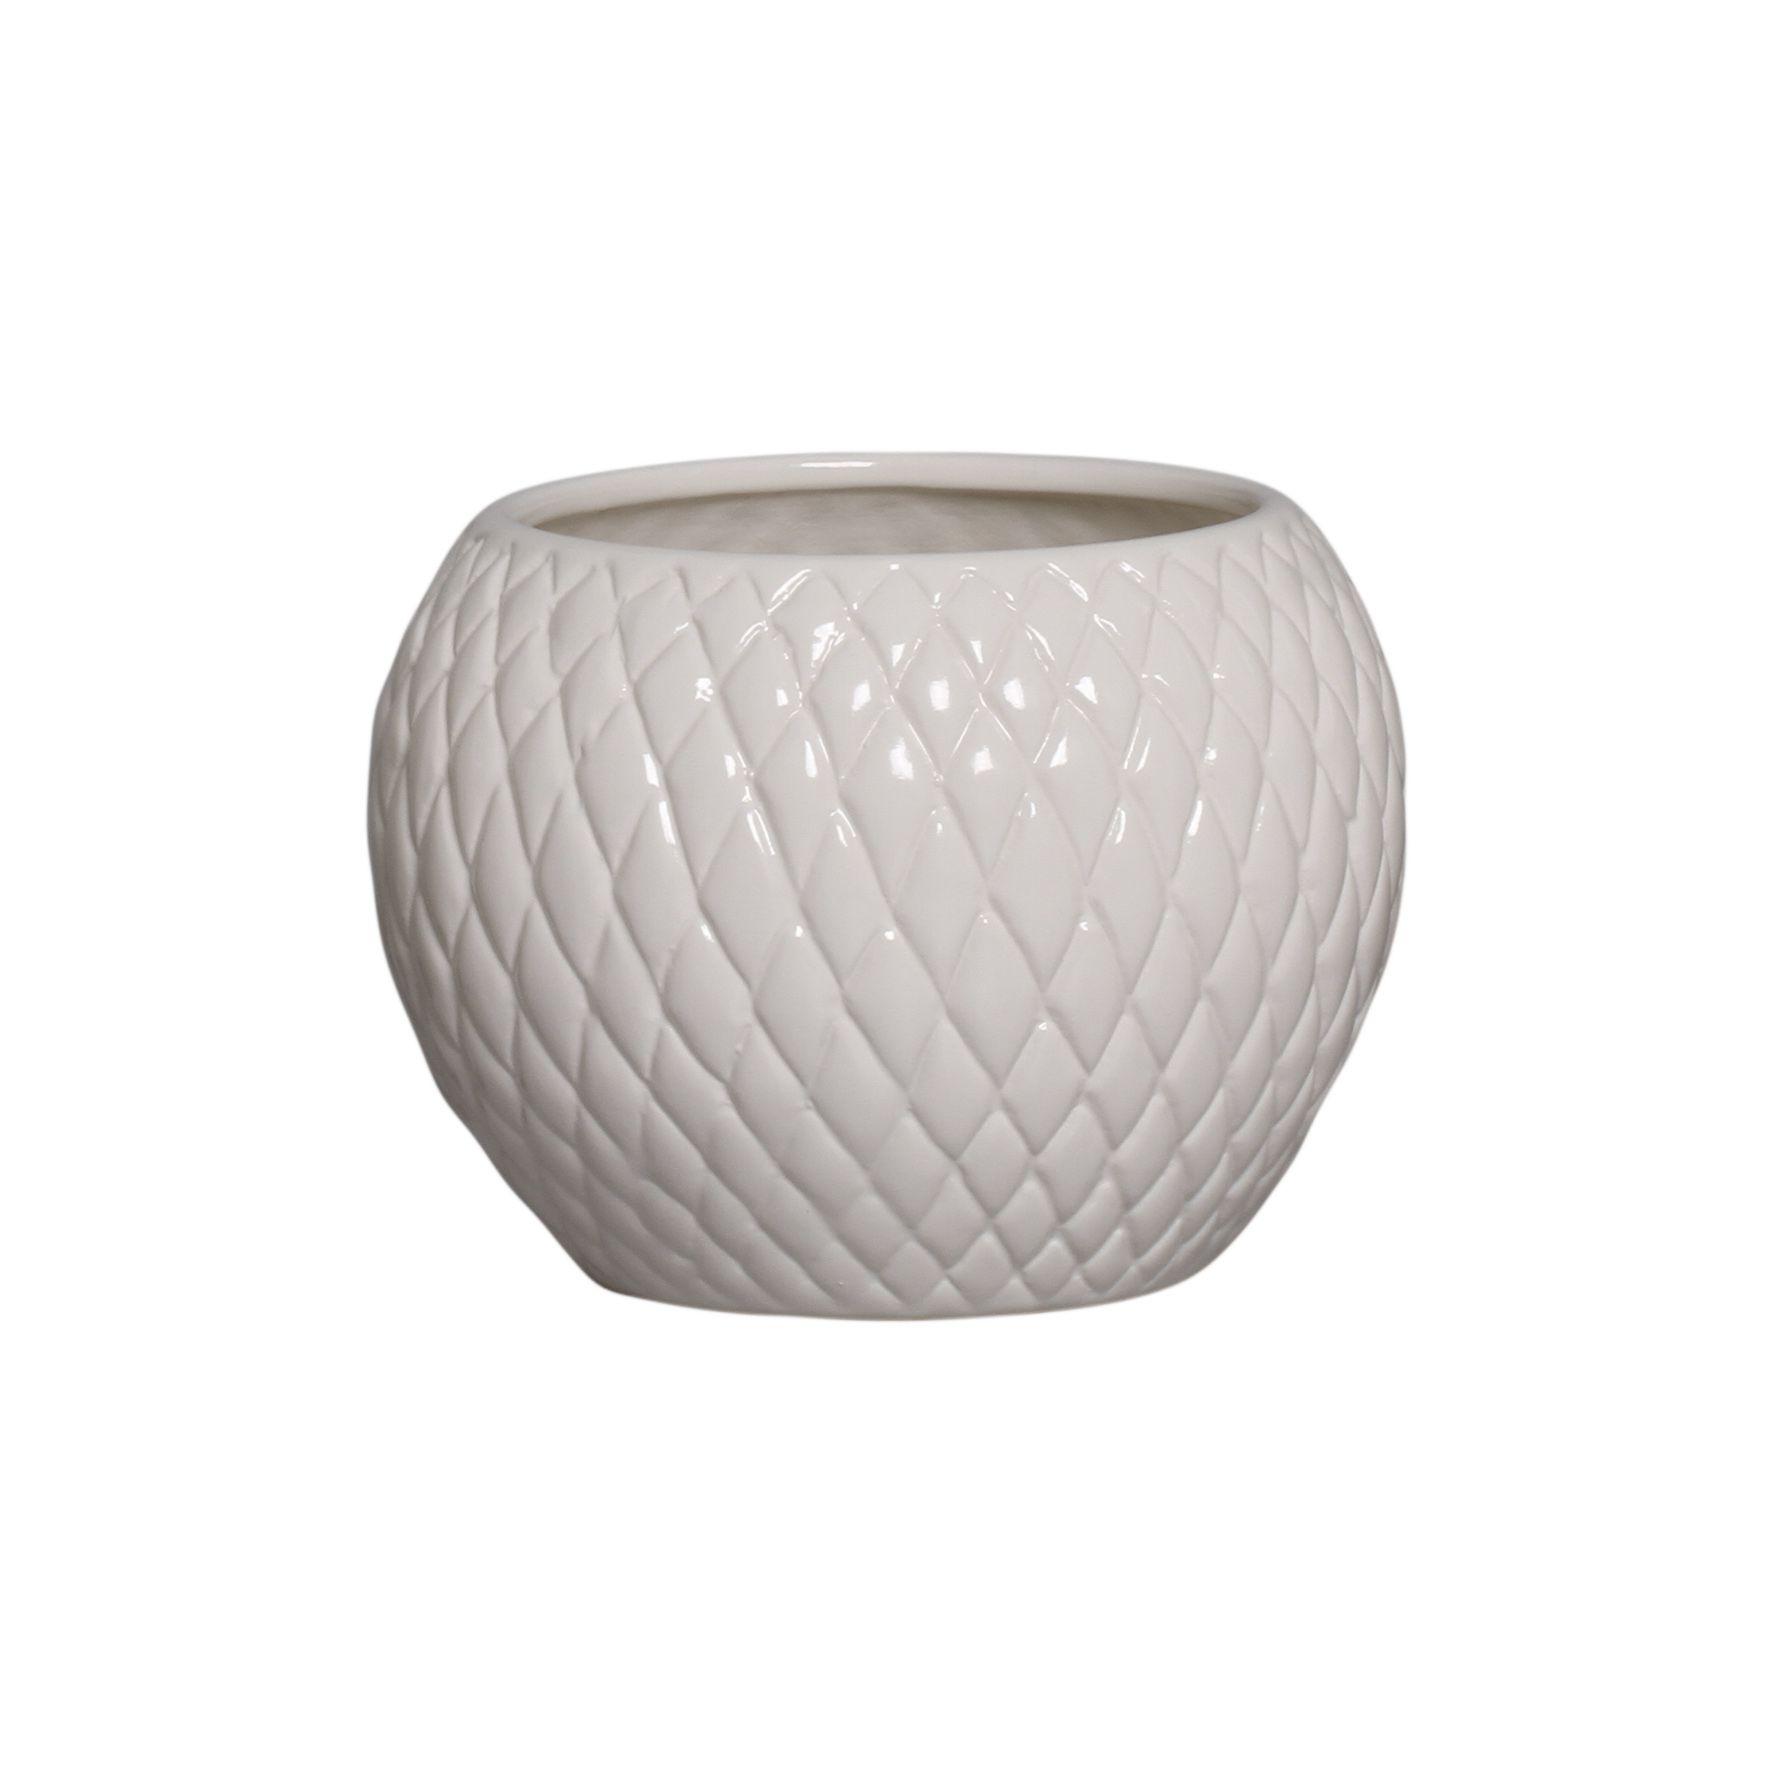 Cachepot de Cerâmica Crema Claro P 14,3x19,3 cm